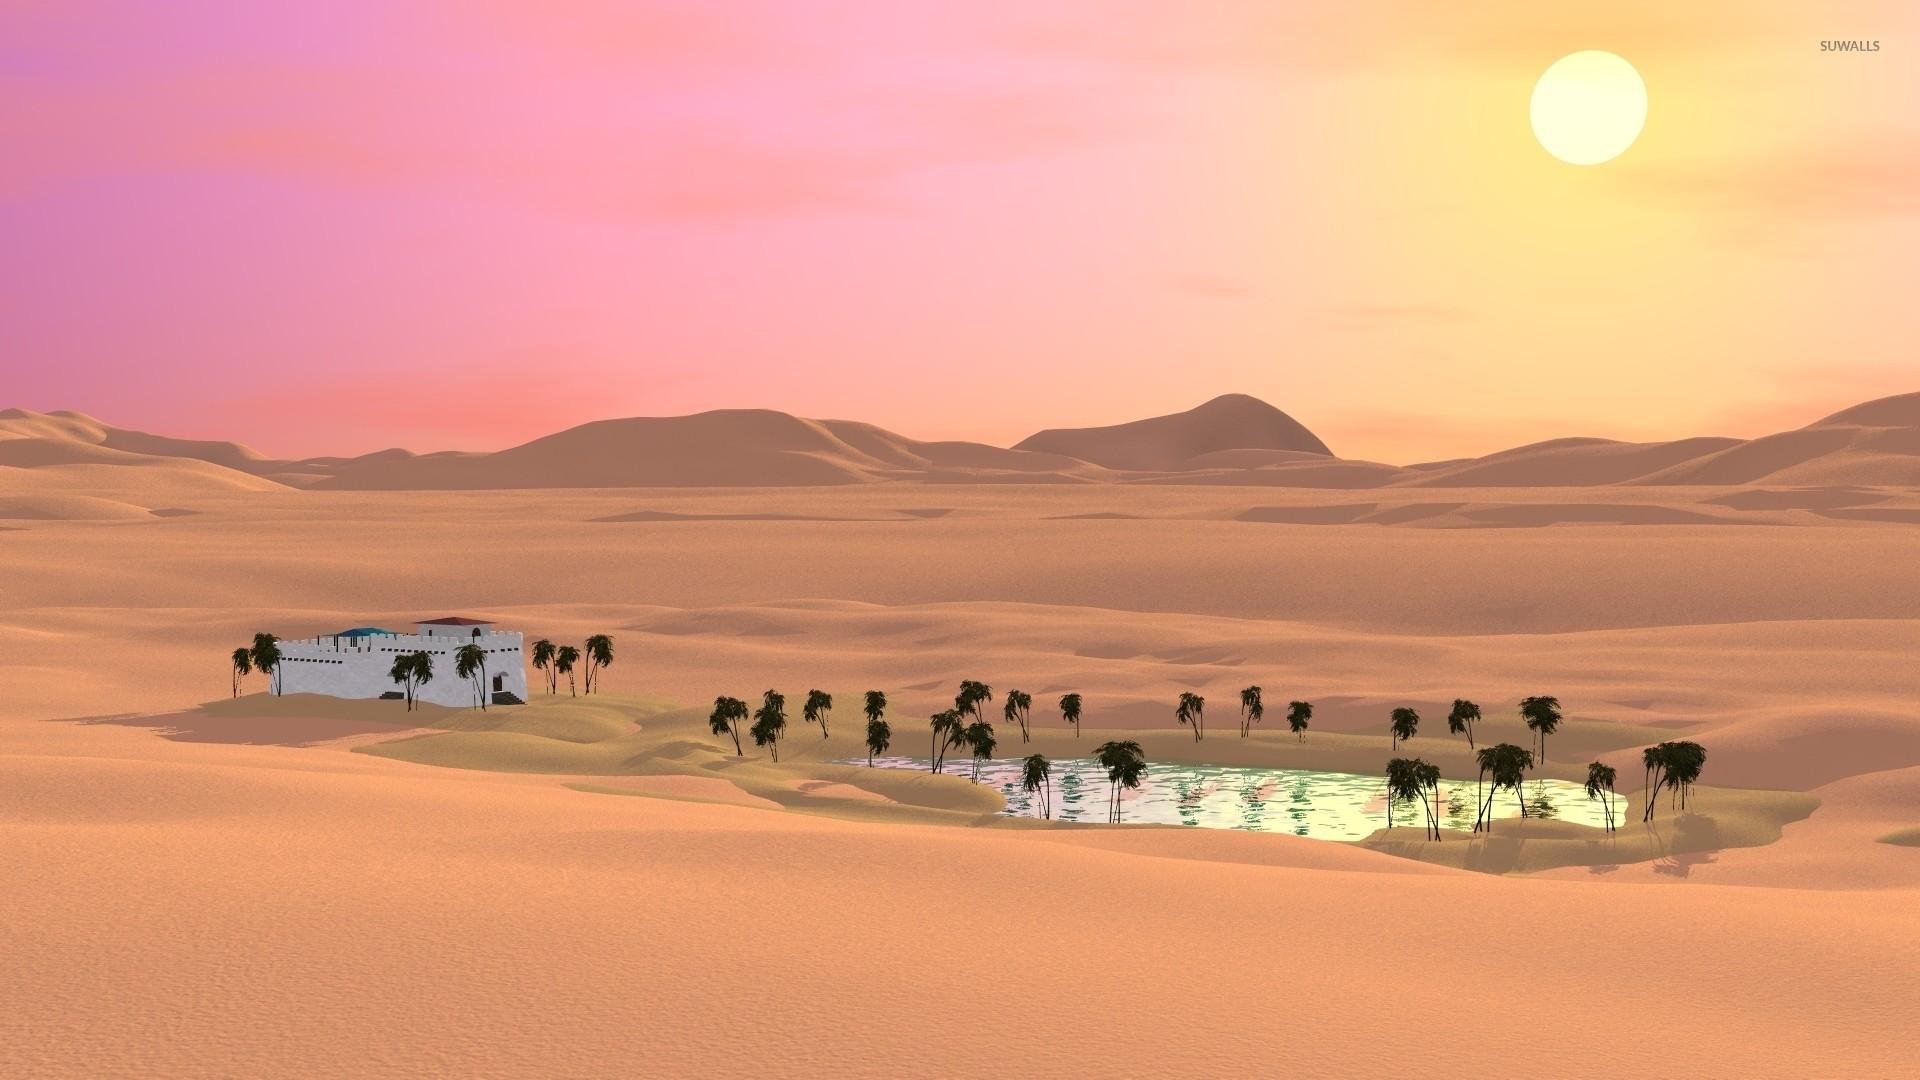 Res: 1920x1080, Oasis in the desert wallpaper